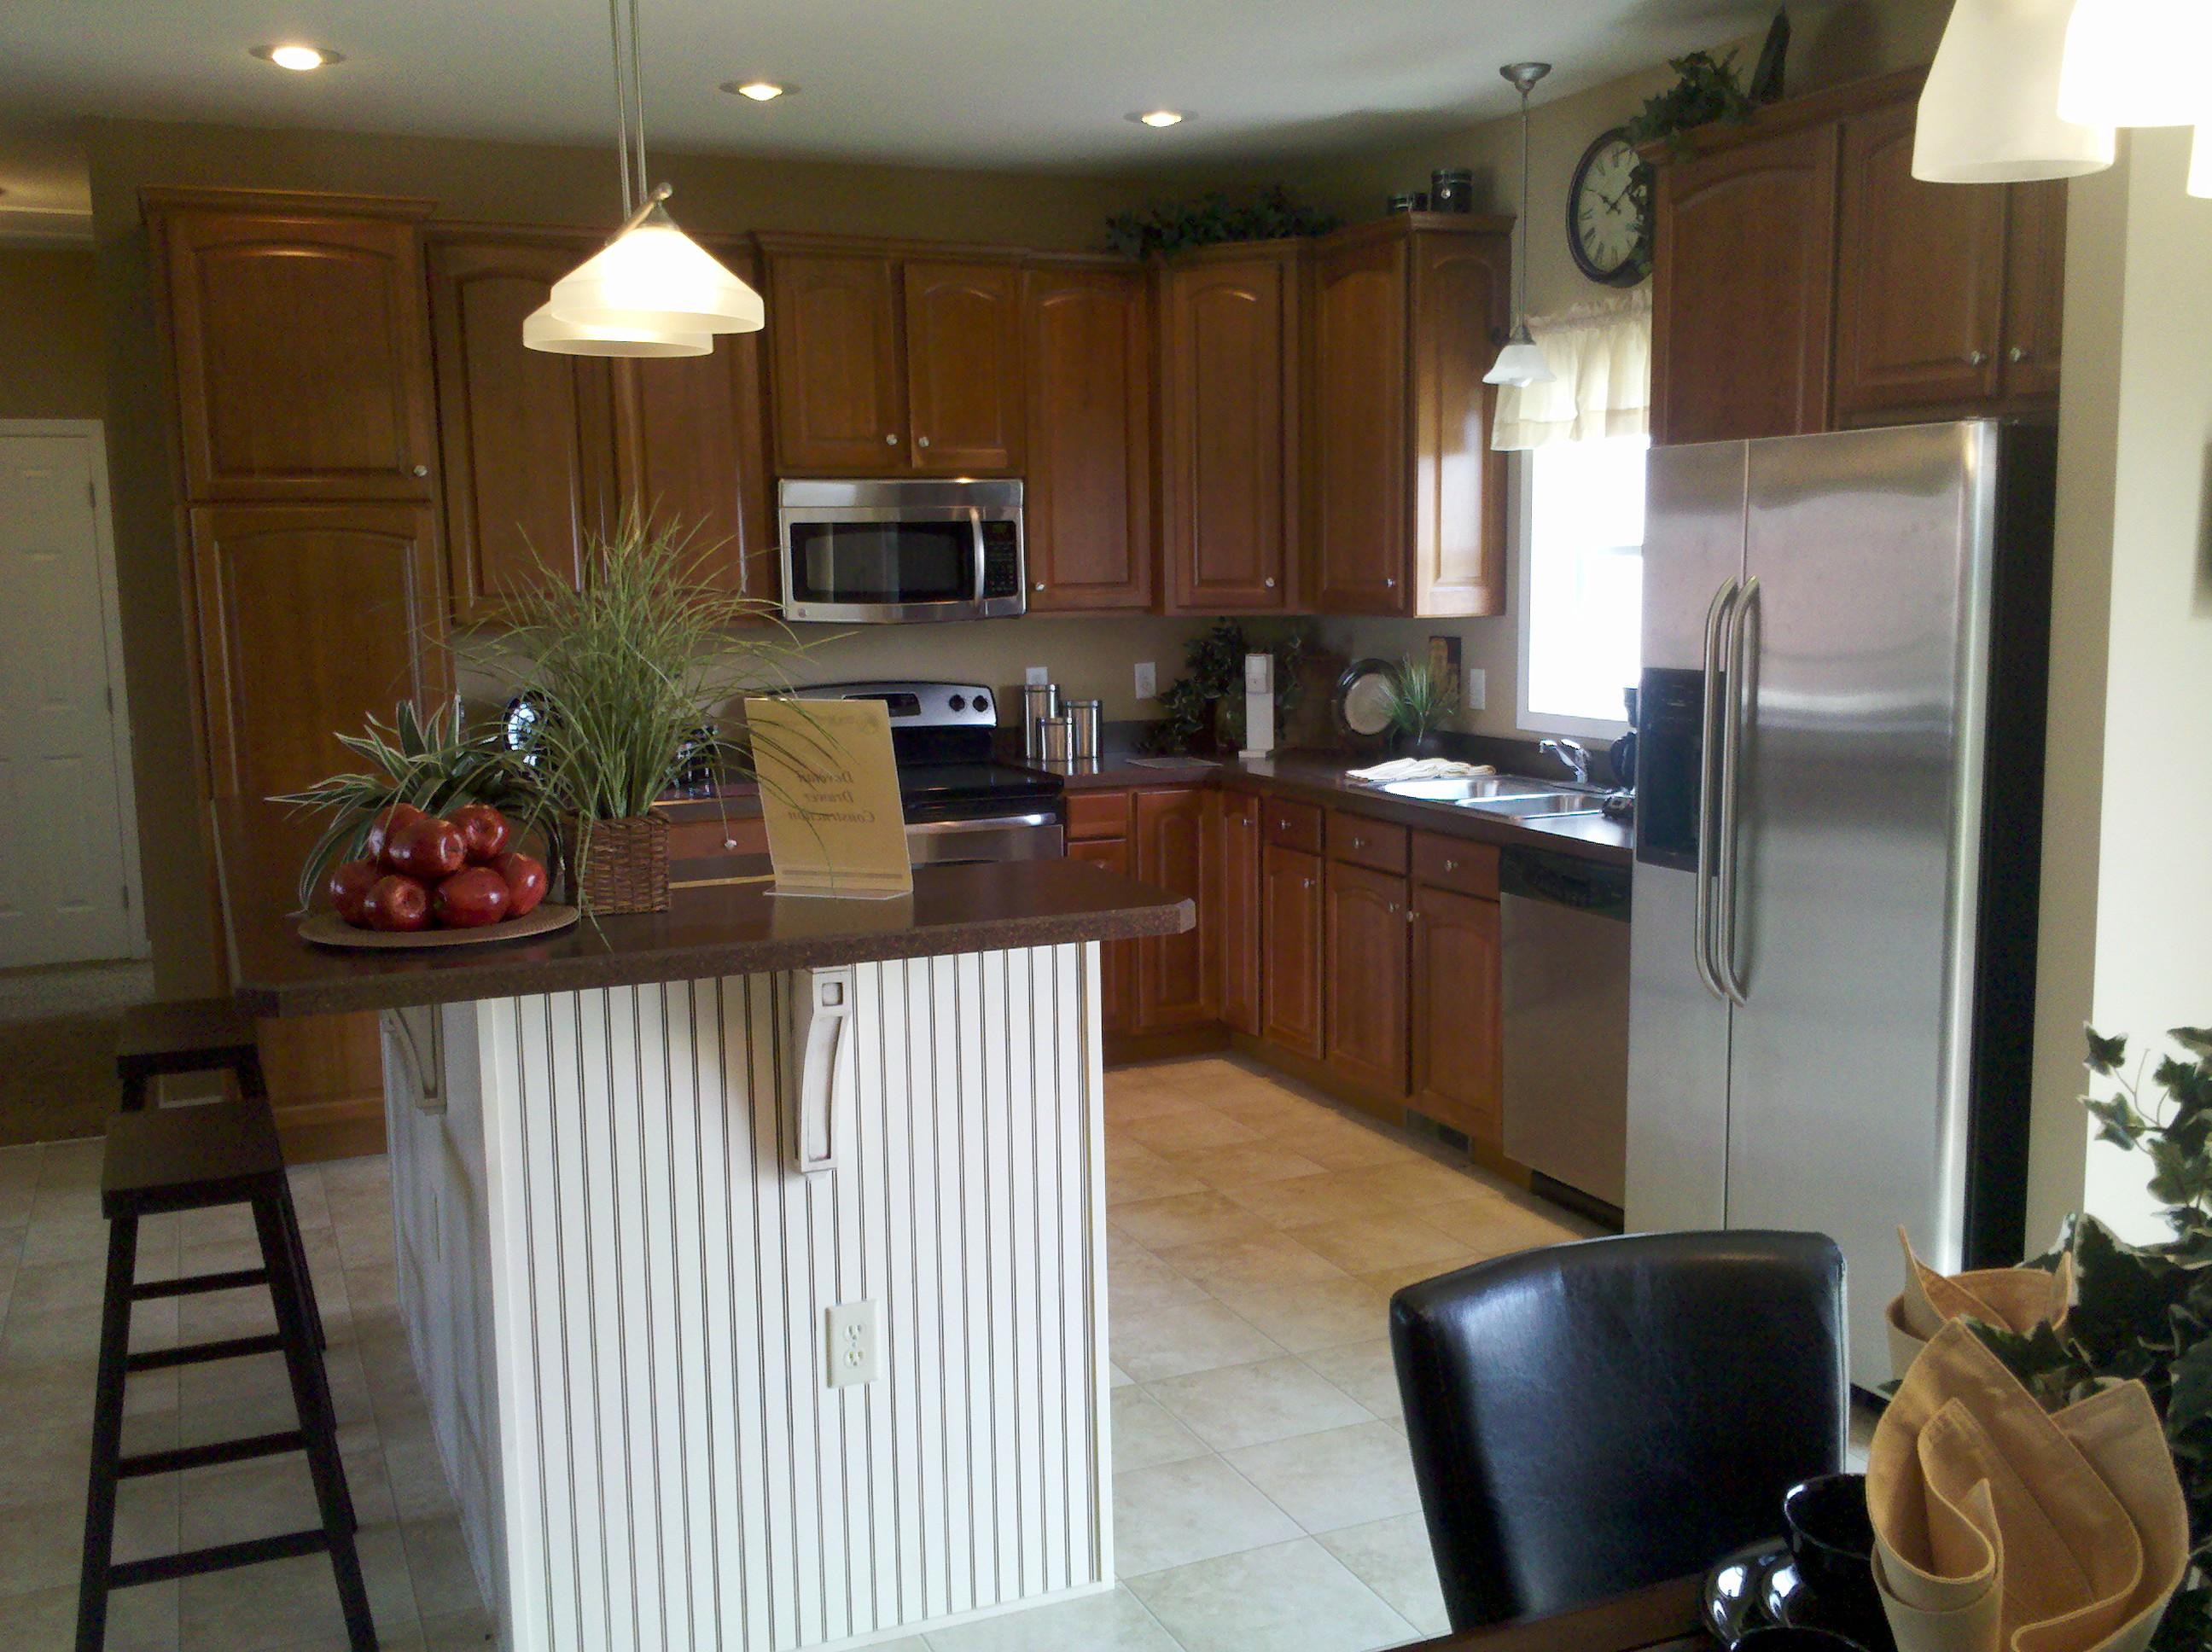 Kitchen Cabinetry - Cherry-White